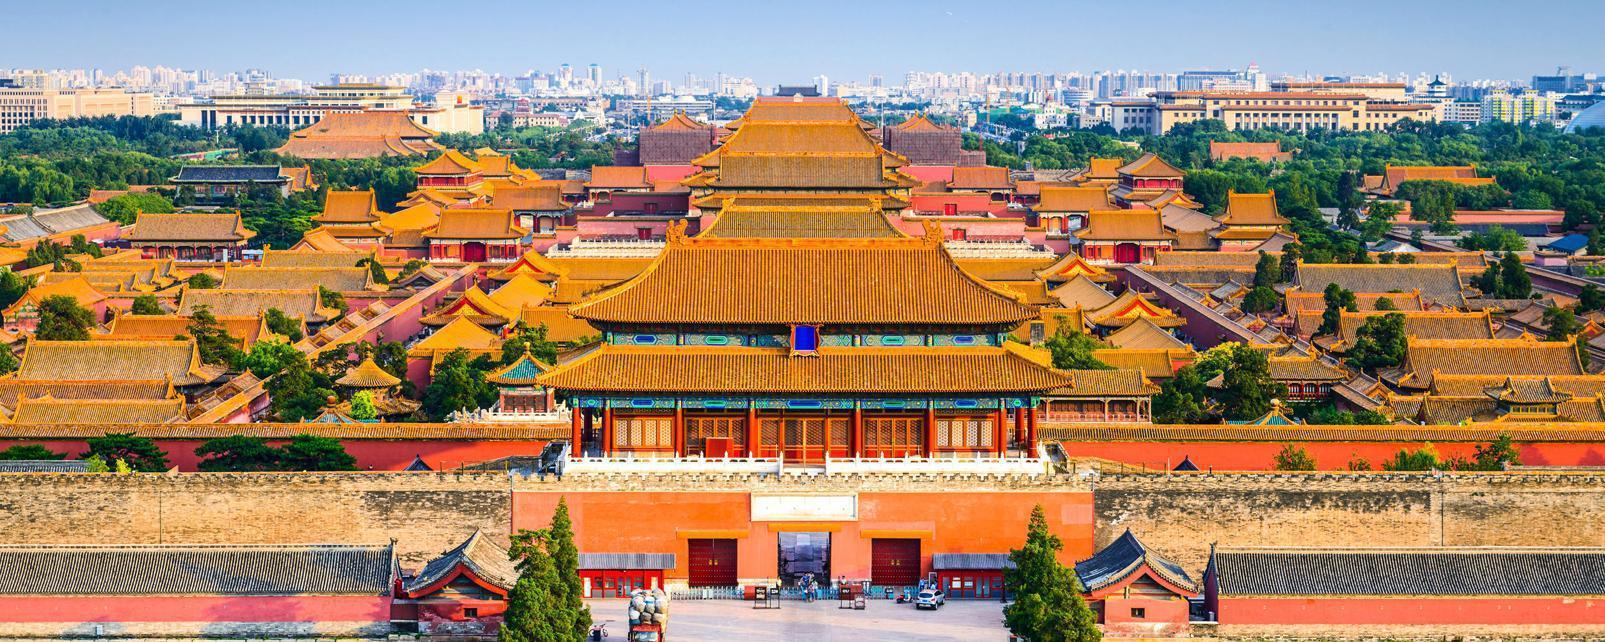 Kel 12 Calendario Viaggi.Advtraining It Kel 12 Rilancia Sulla Cina